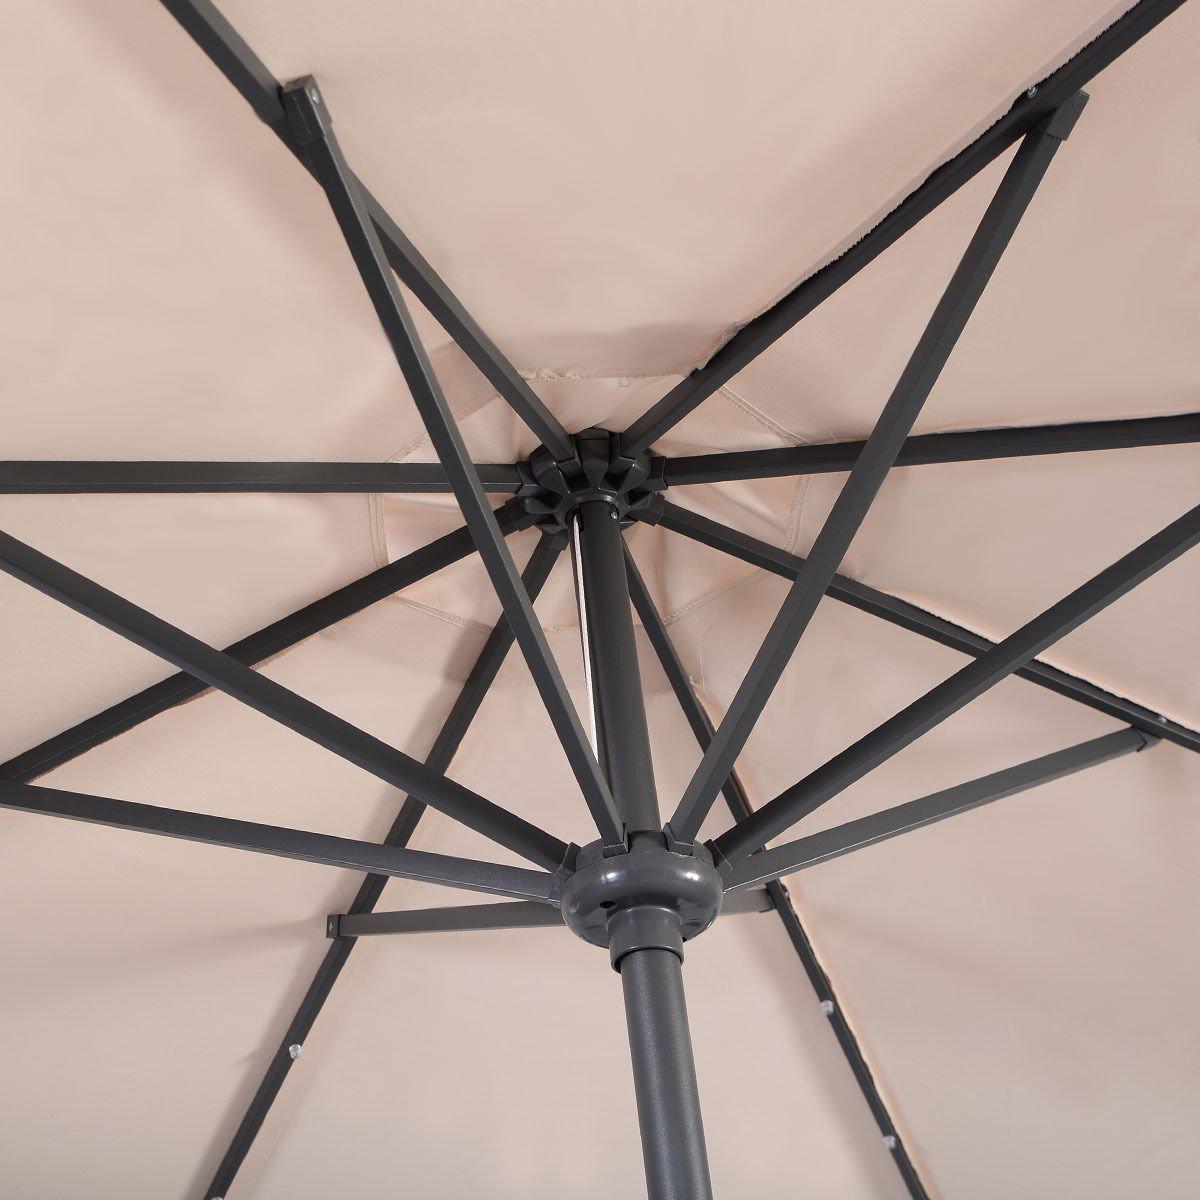 Giantex 10FT Patio Solar Umbrella LED Patio Market Steel Tilt W/ Crank Outdoor New